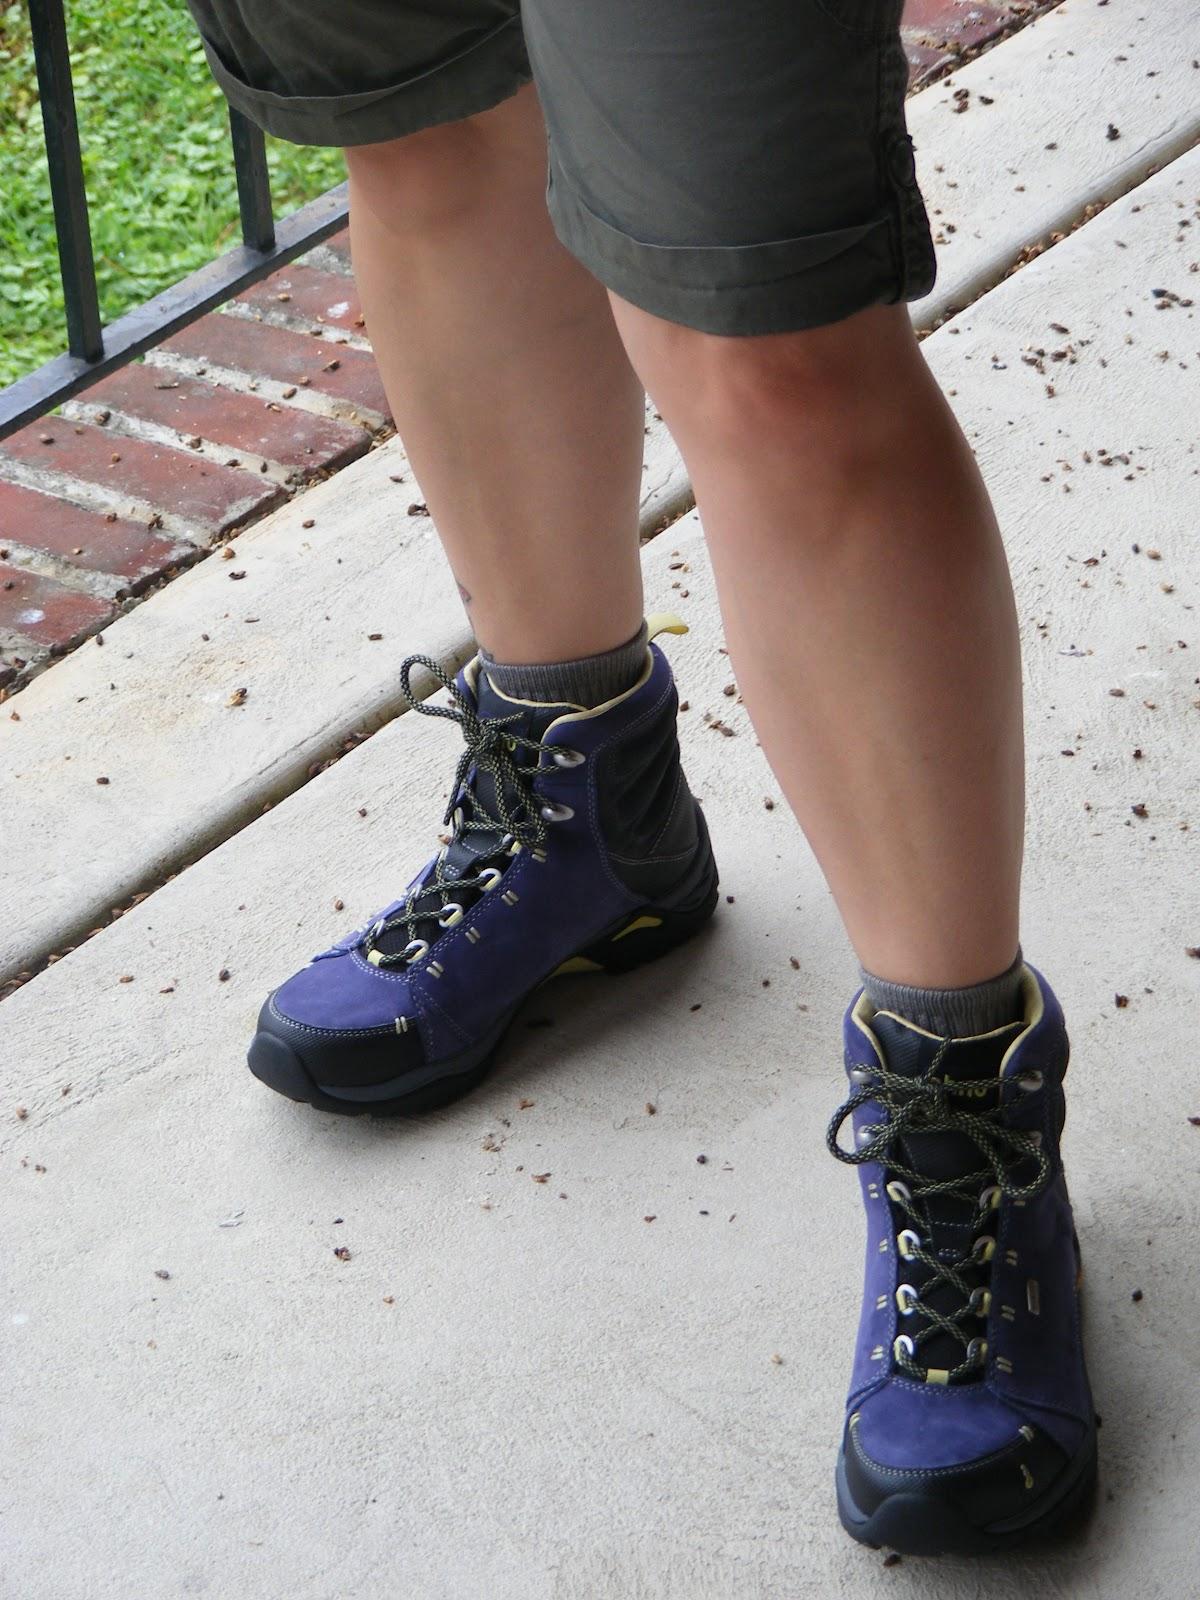 Do Ahnu Shoes Run True To Size